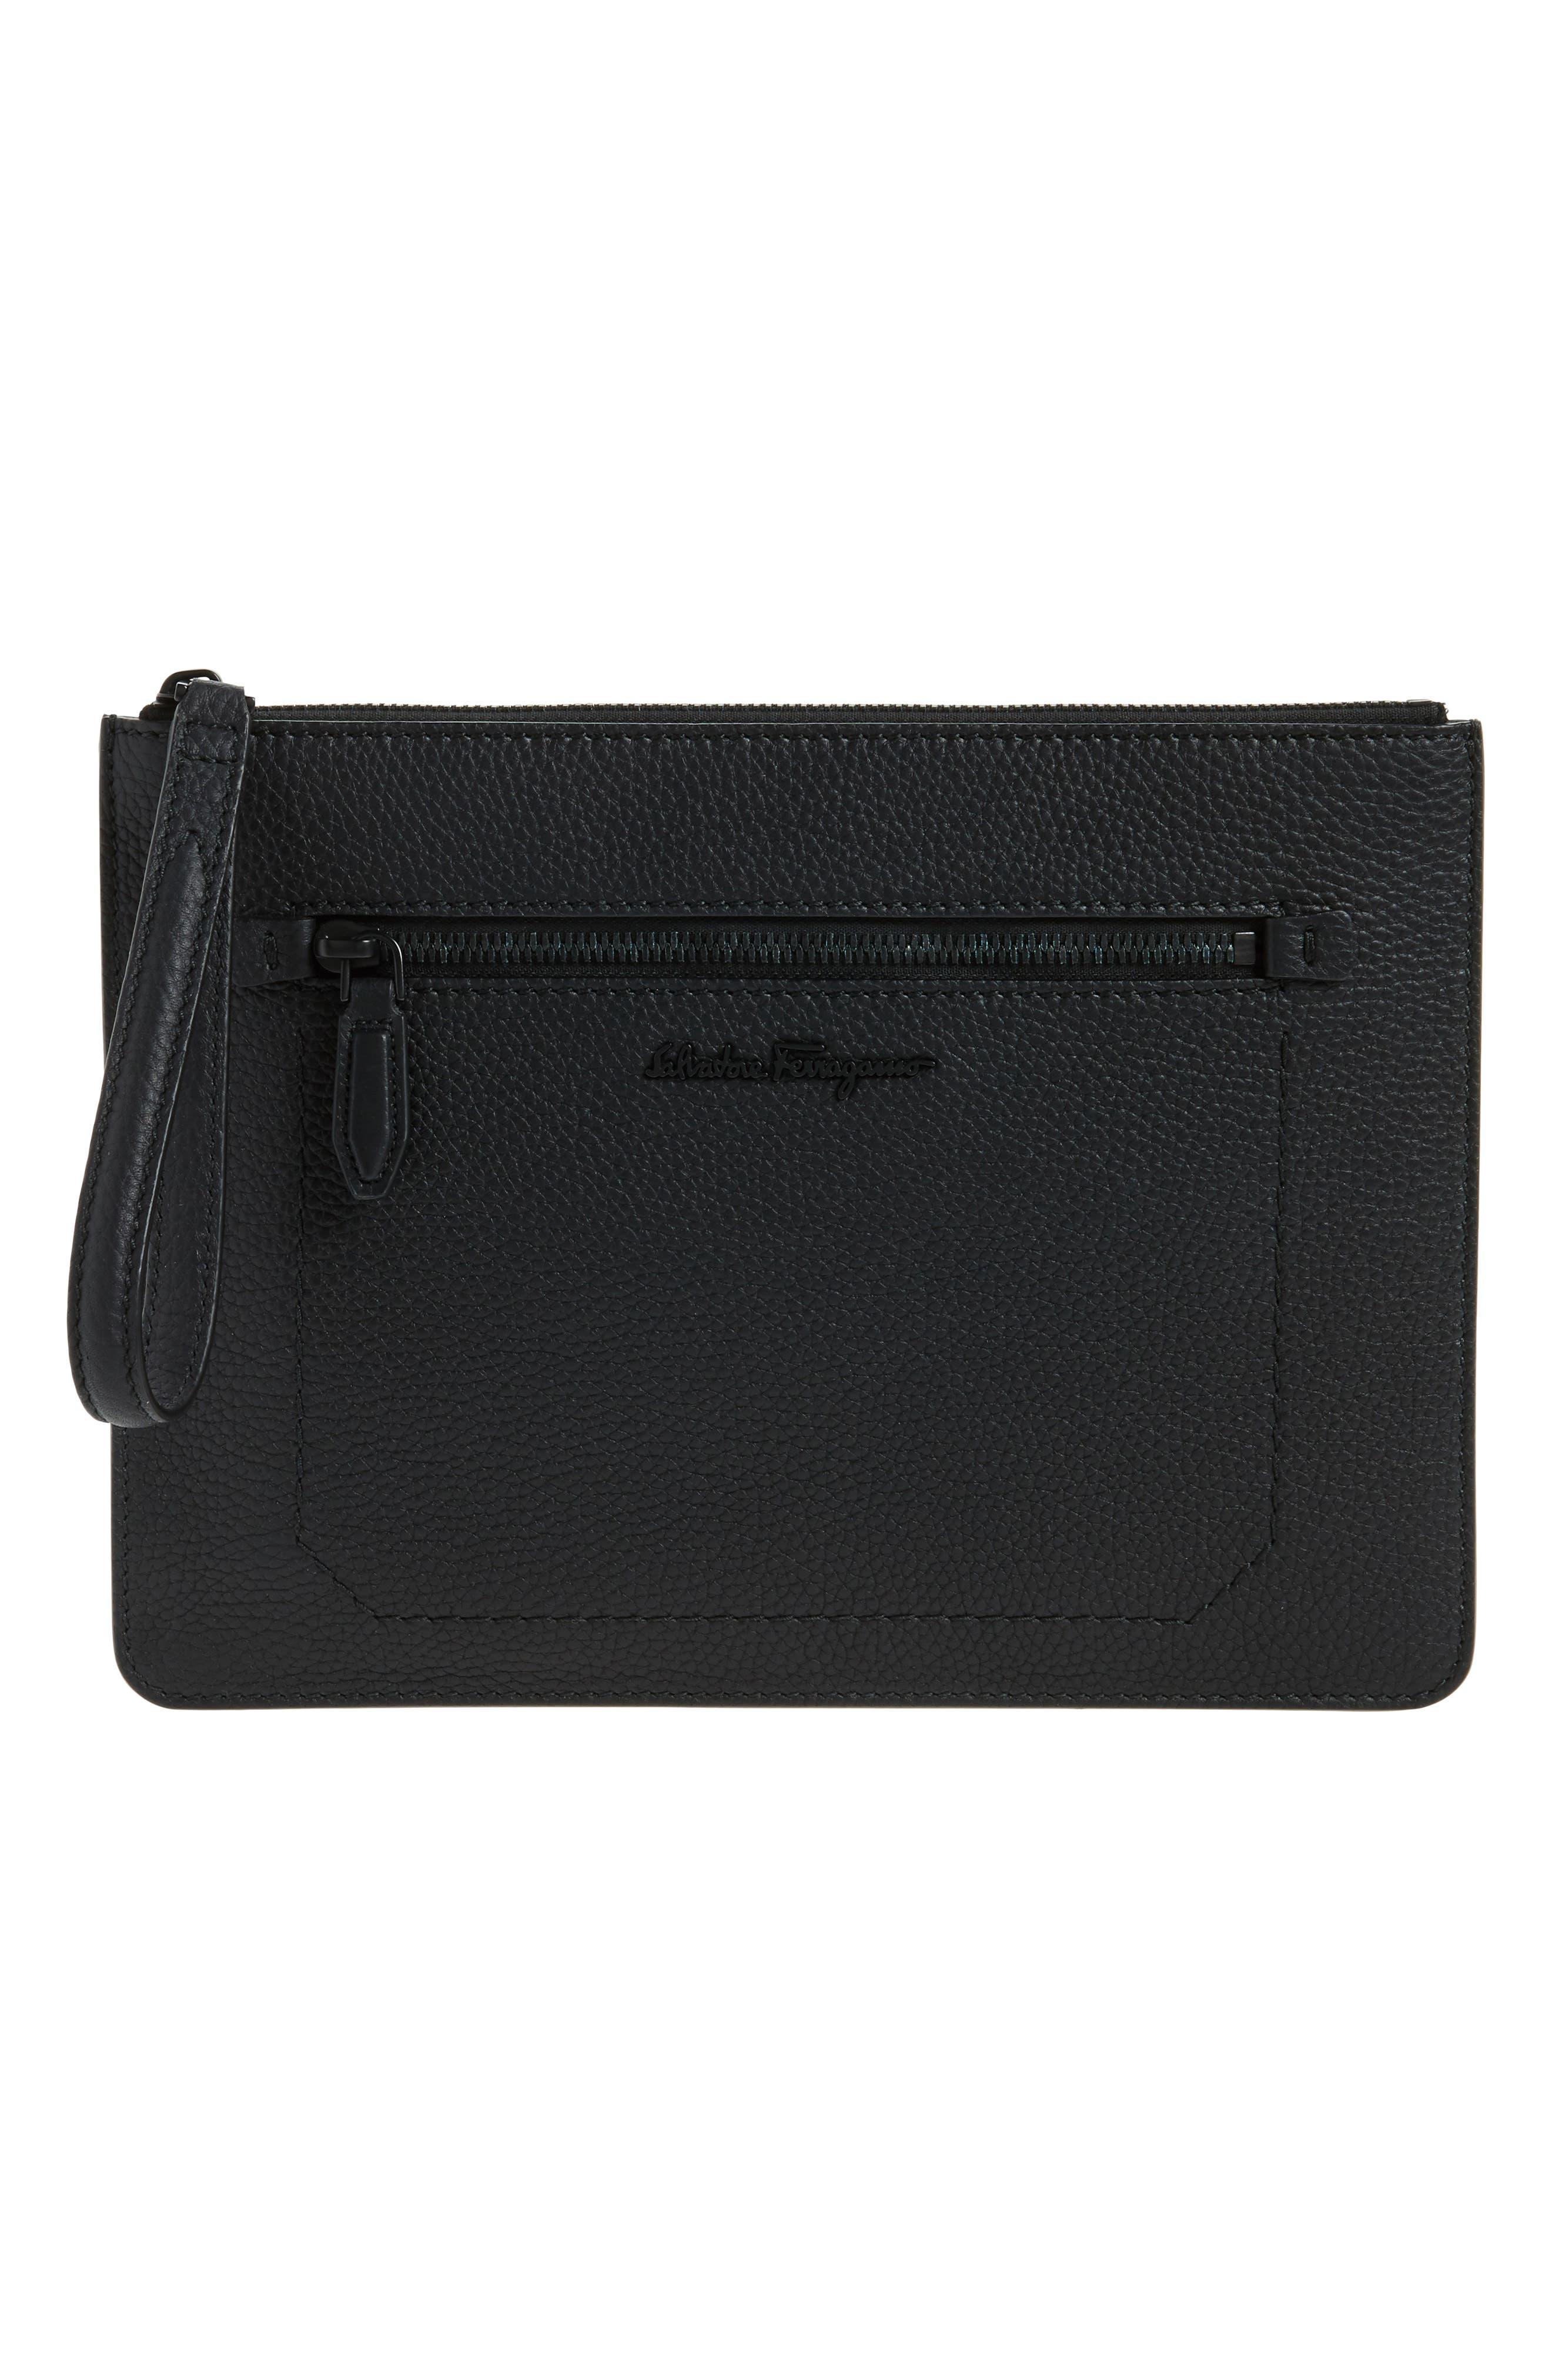 SALVATORE FERRAGAMO Calfskin Leather Portfolio, Main, color, 001